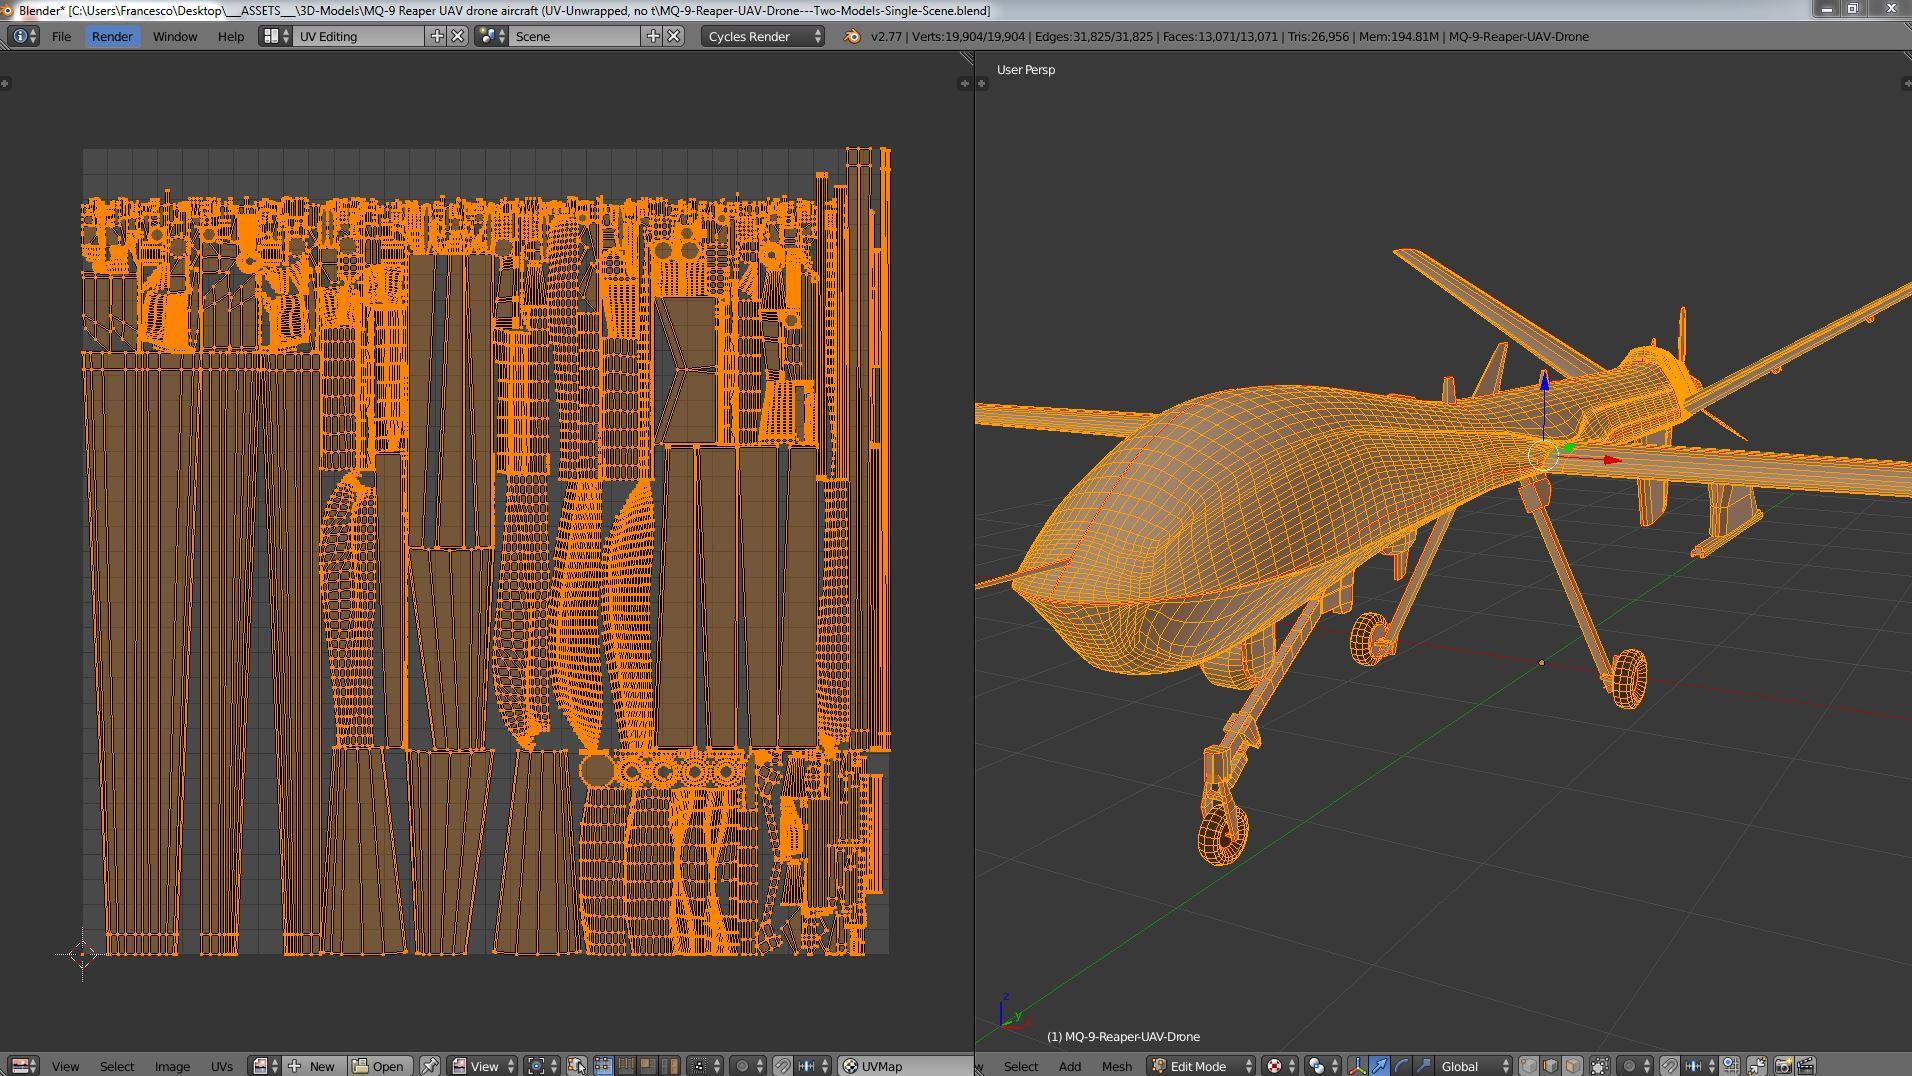 MQ-9 Reaper UAV Drone (two models: gear up/down)